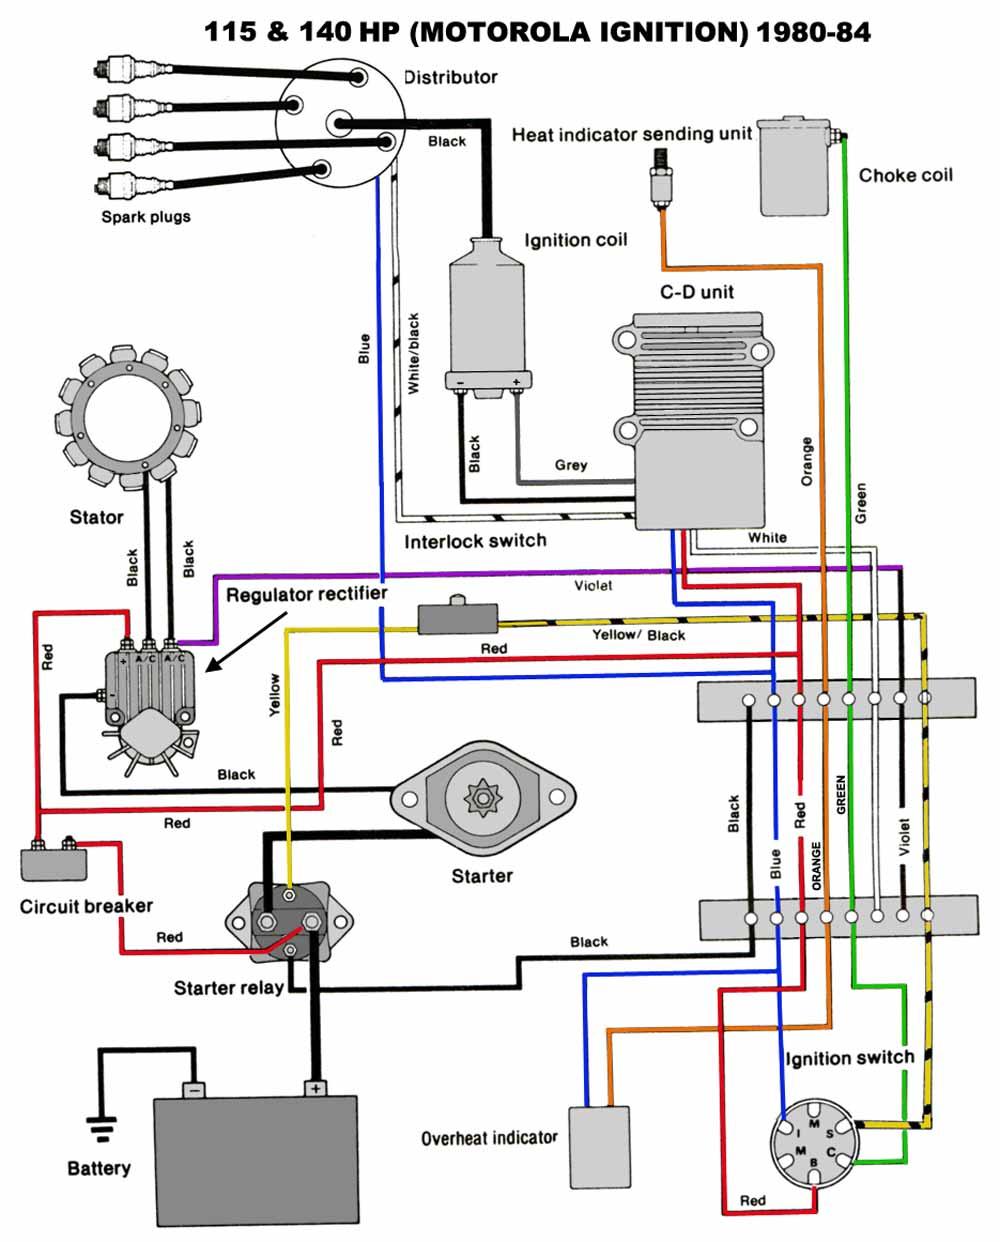 115_140Motorola?resize=665%2C826 suzuki 140 outboard wiring diagrams wiring diagram  at fashall.co